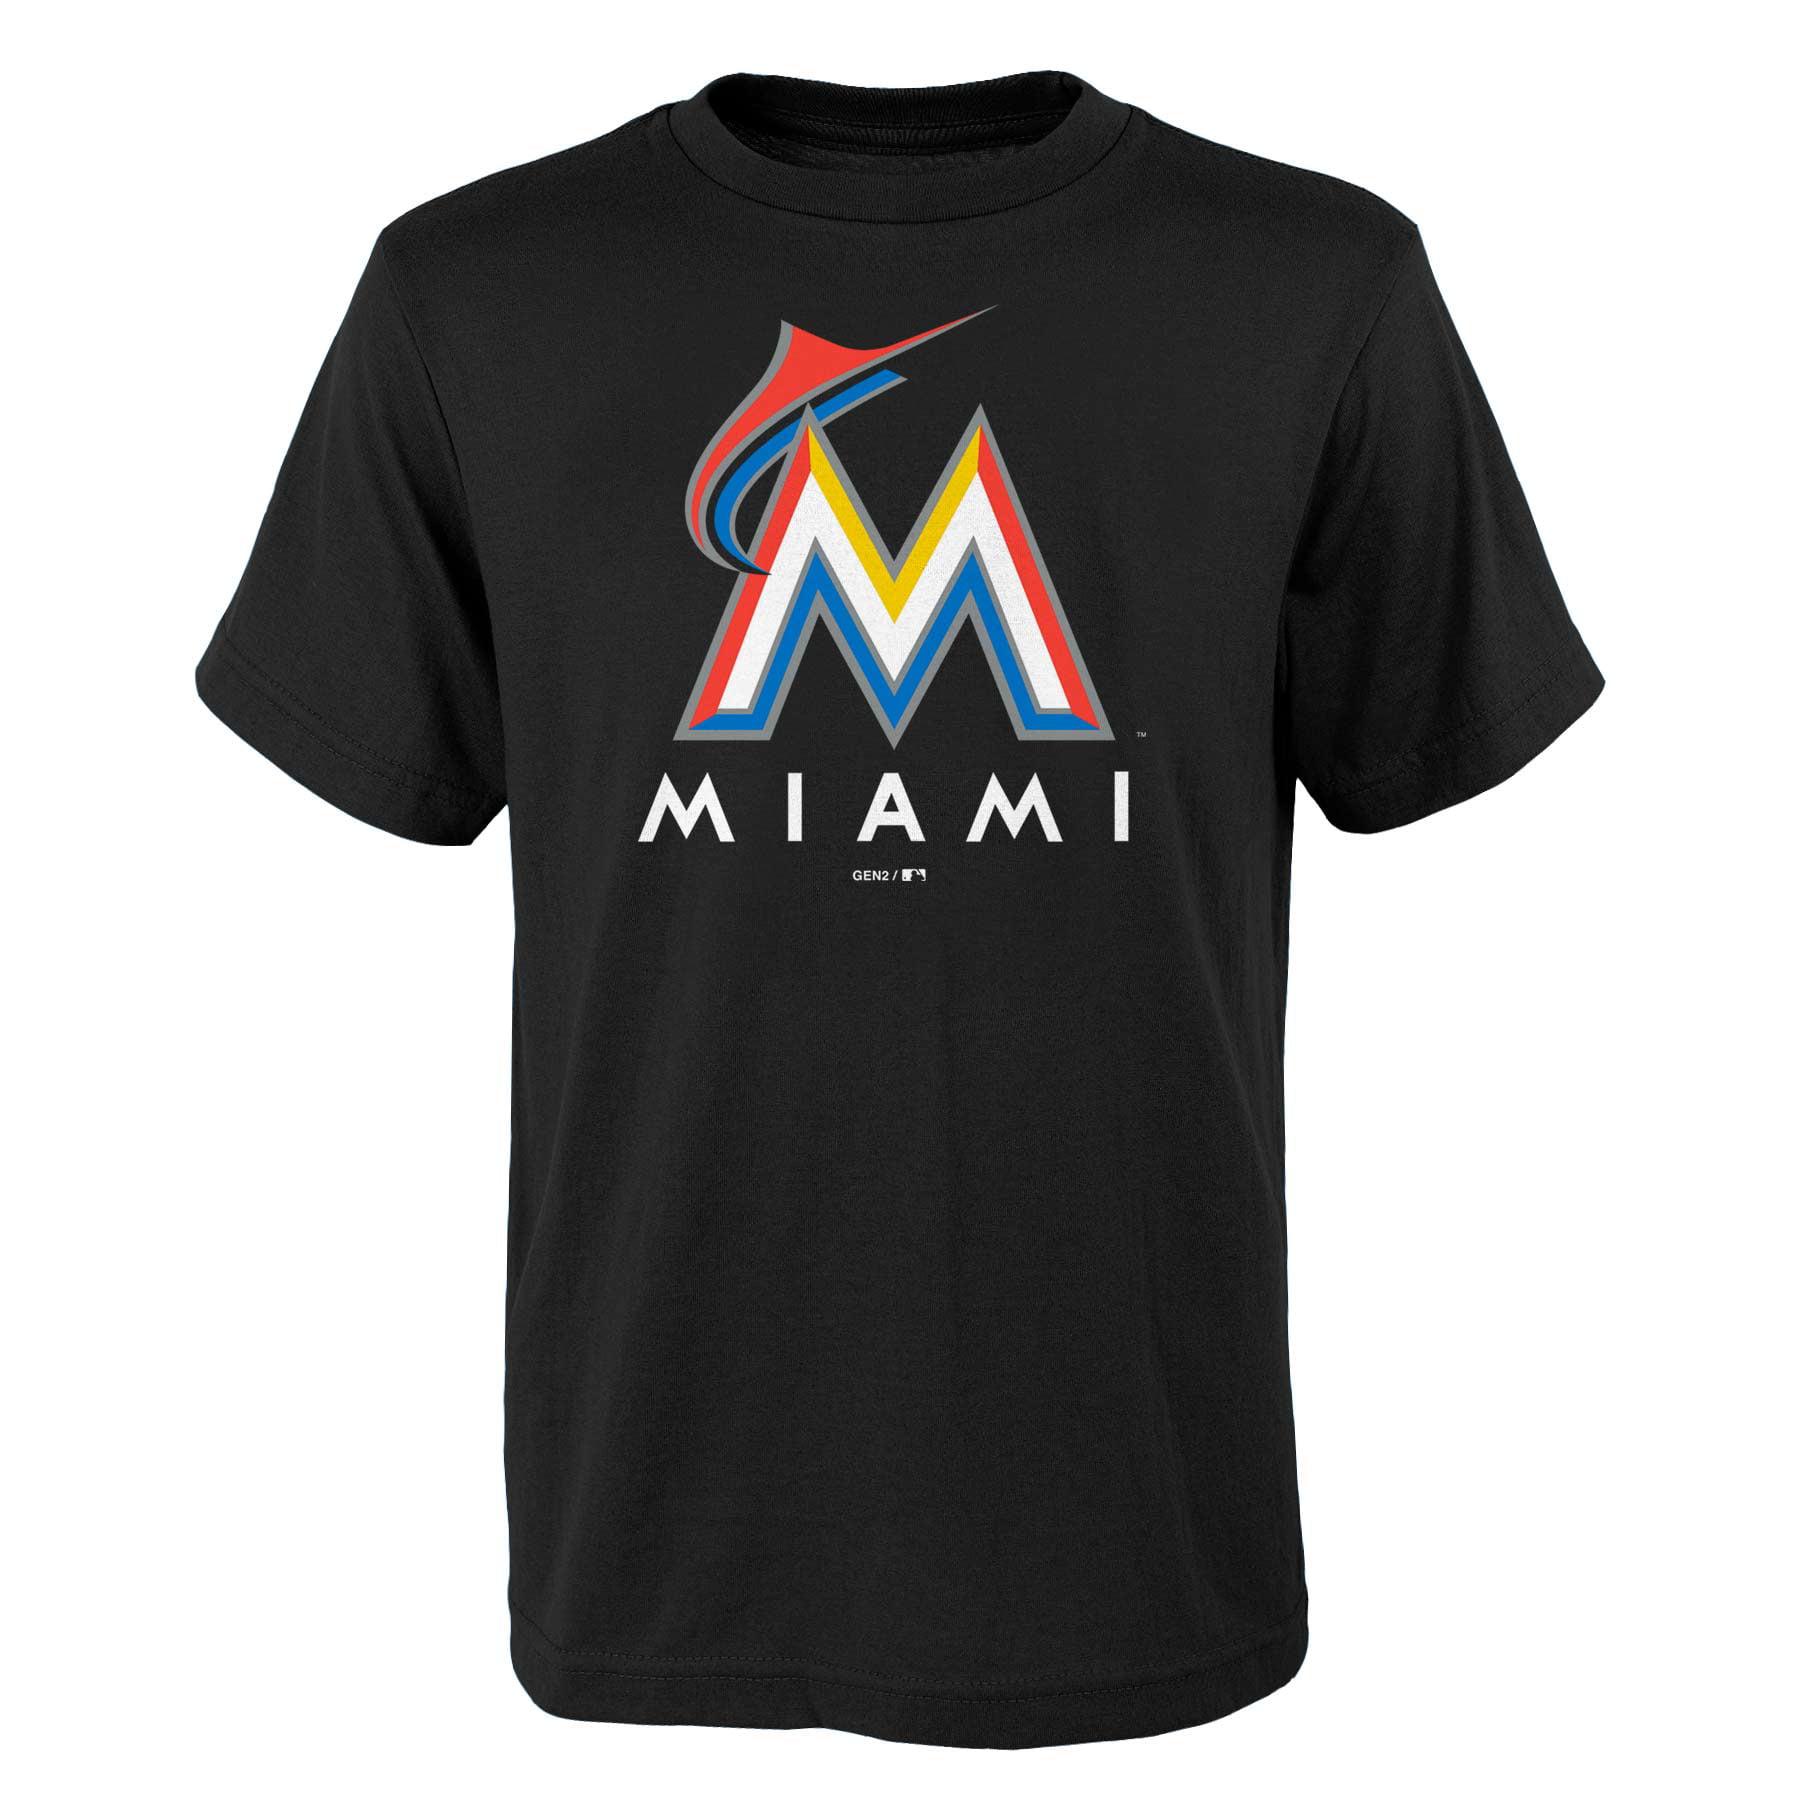 Miami Marlins Youth Primary Logo T-Shirt - Black